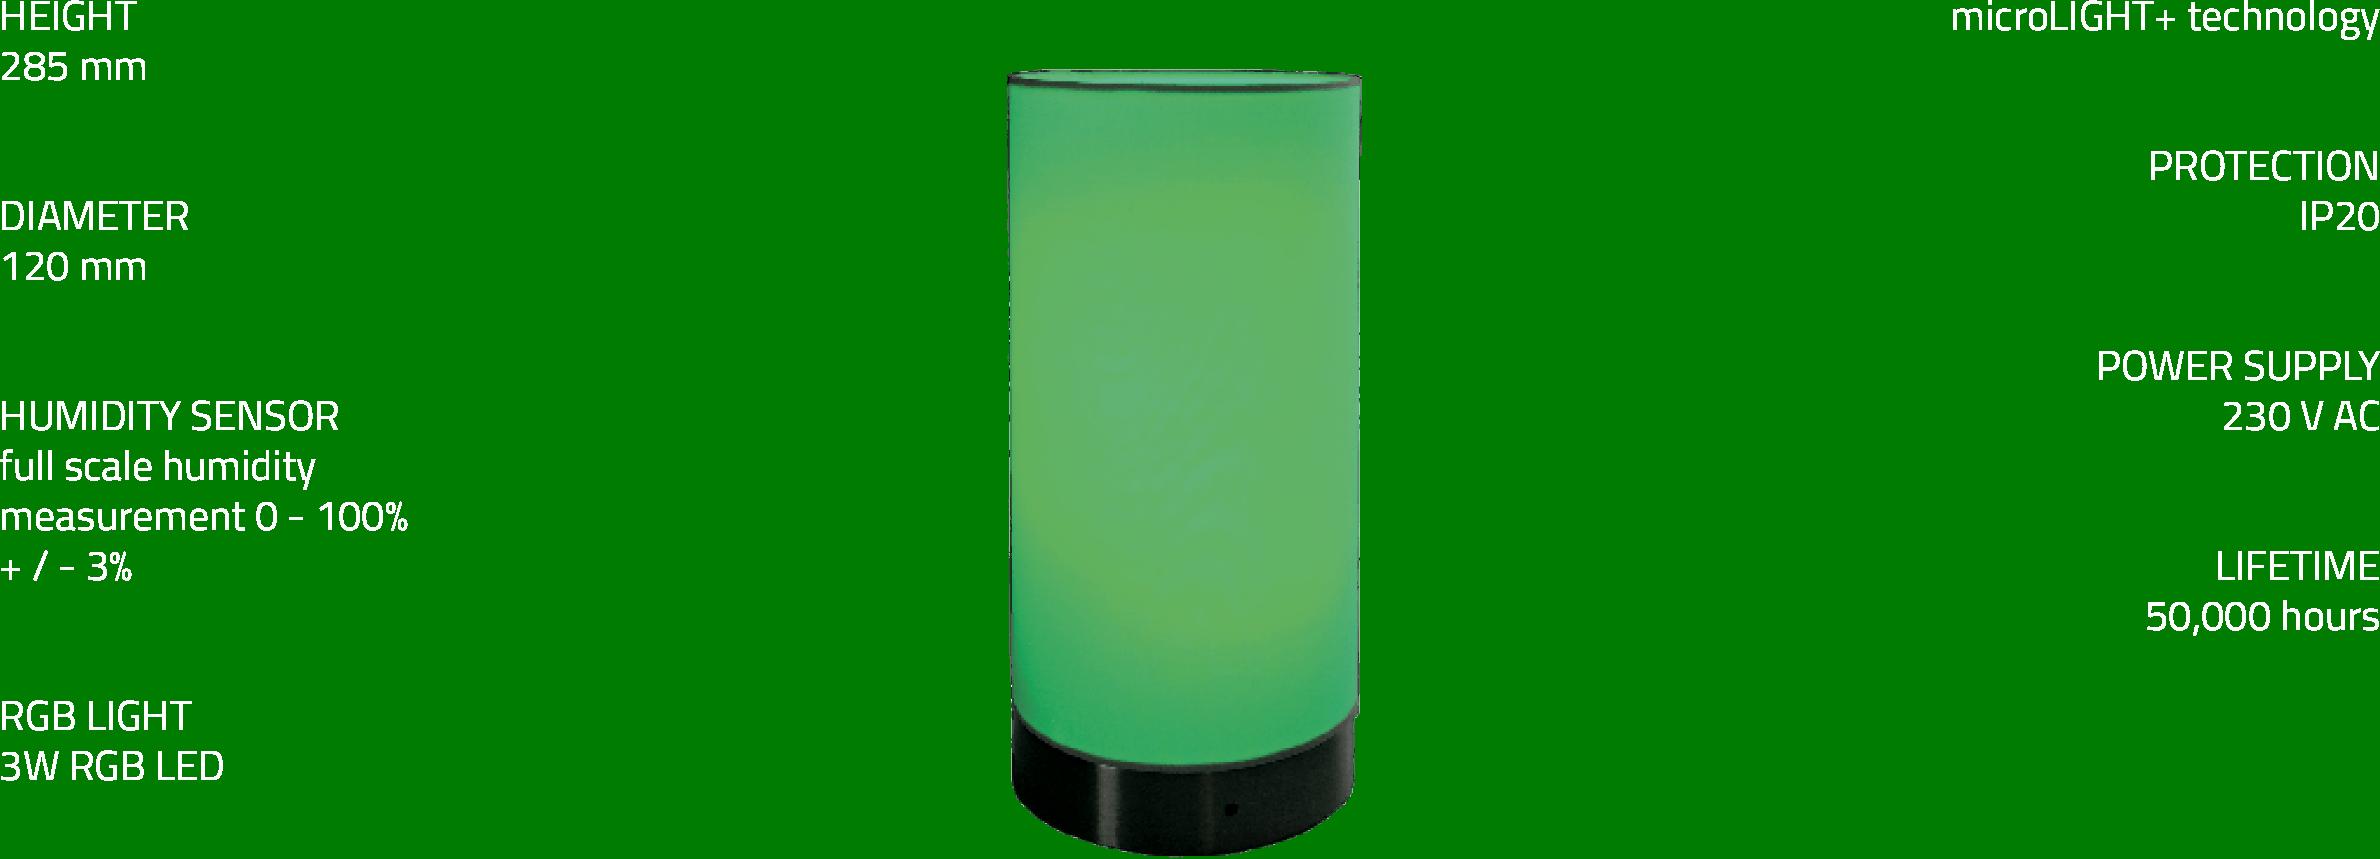 microLIGHT+ lamp - Microwell